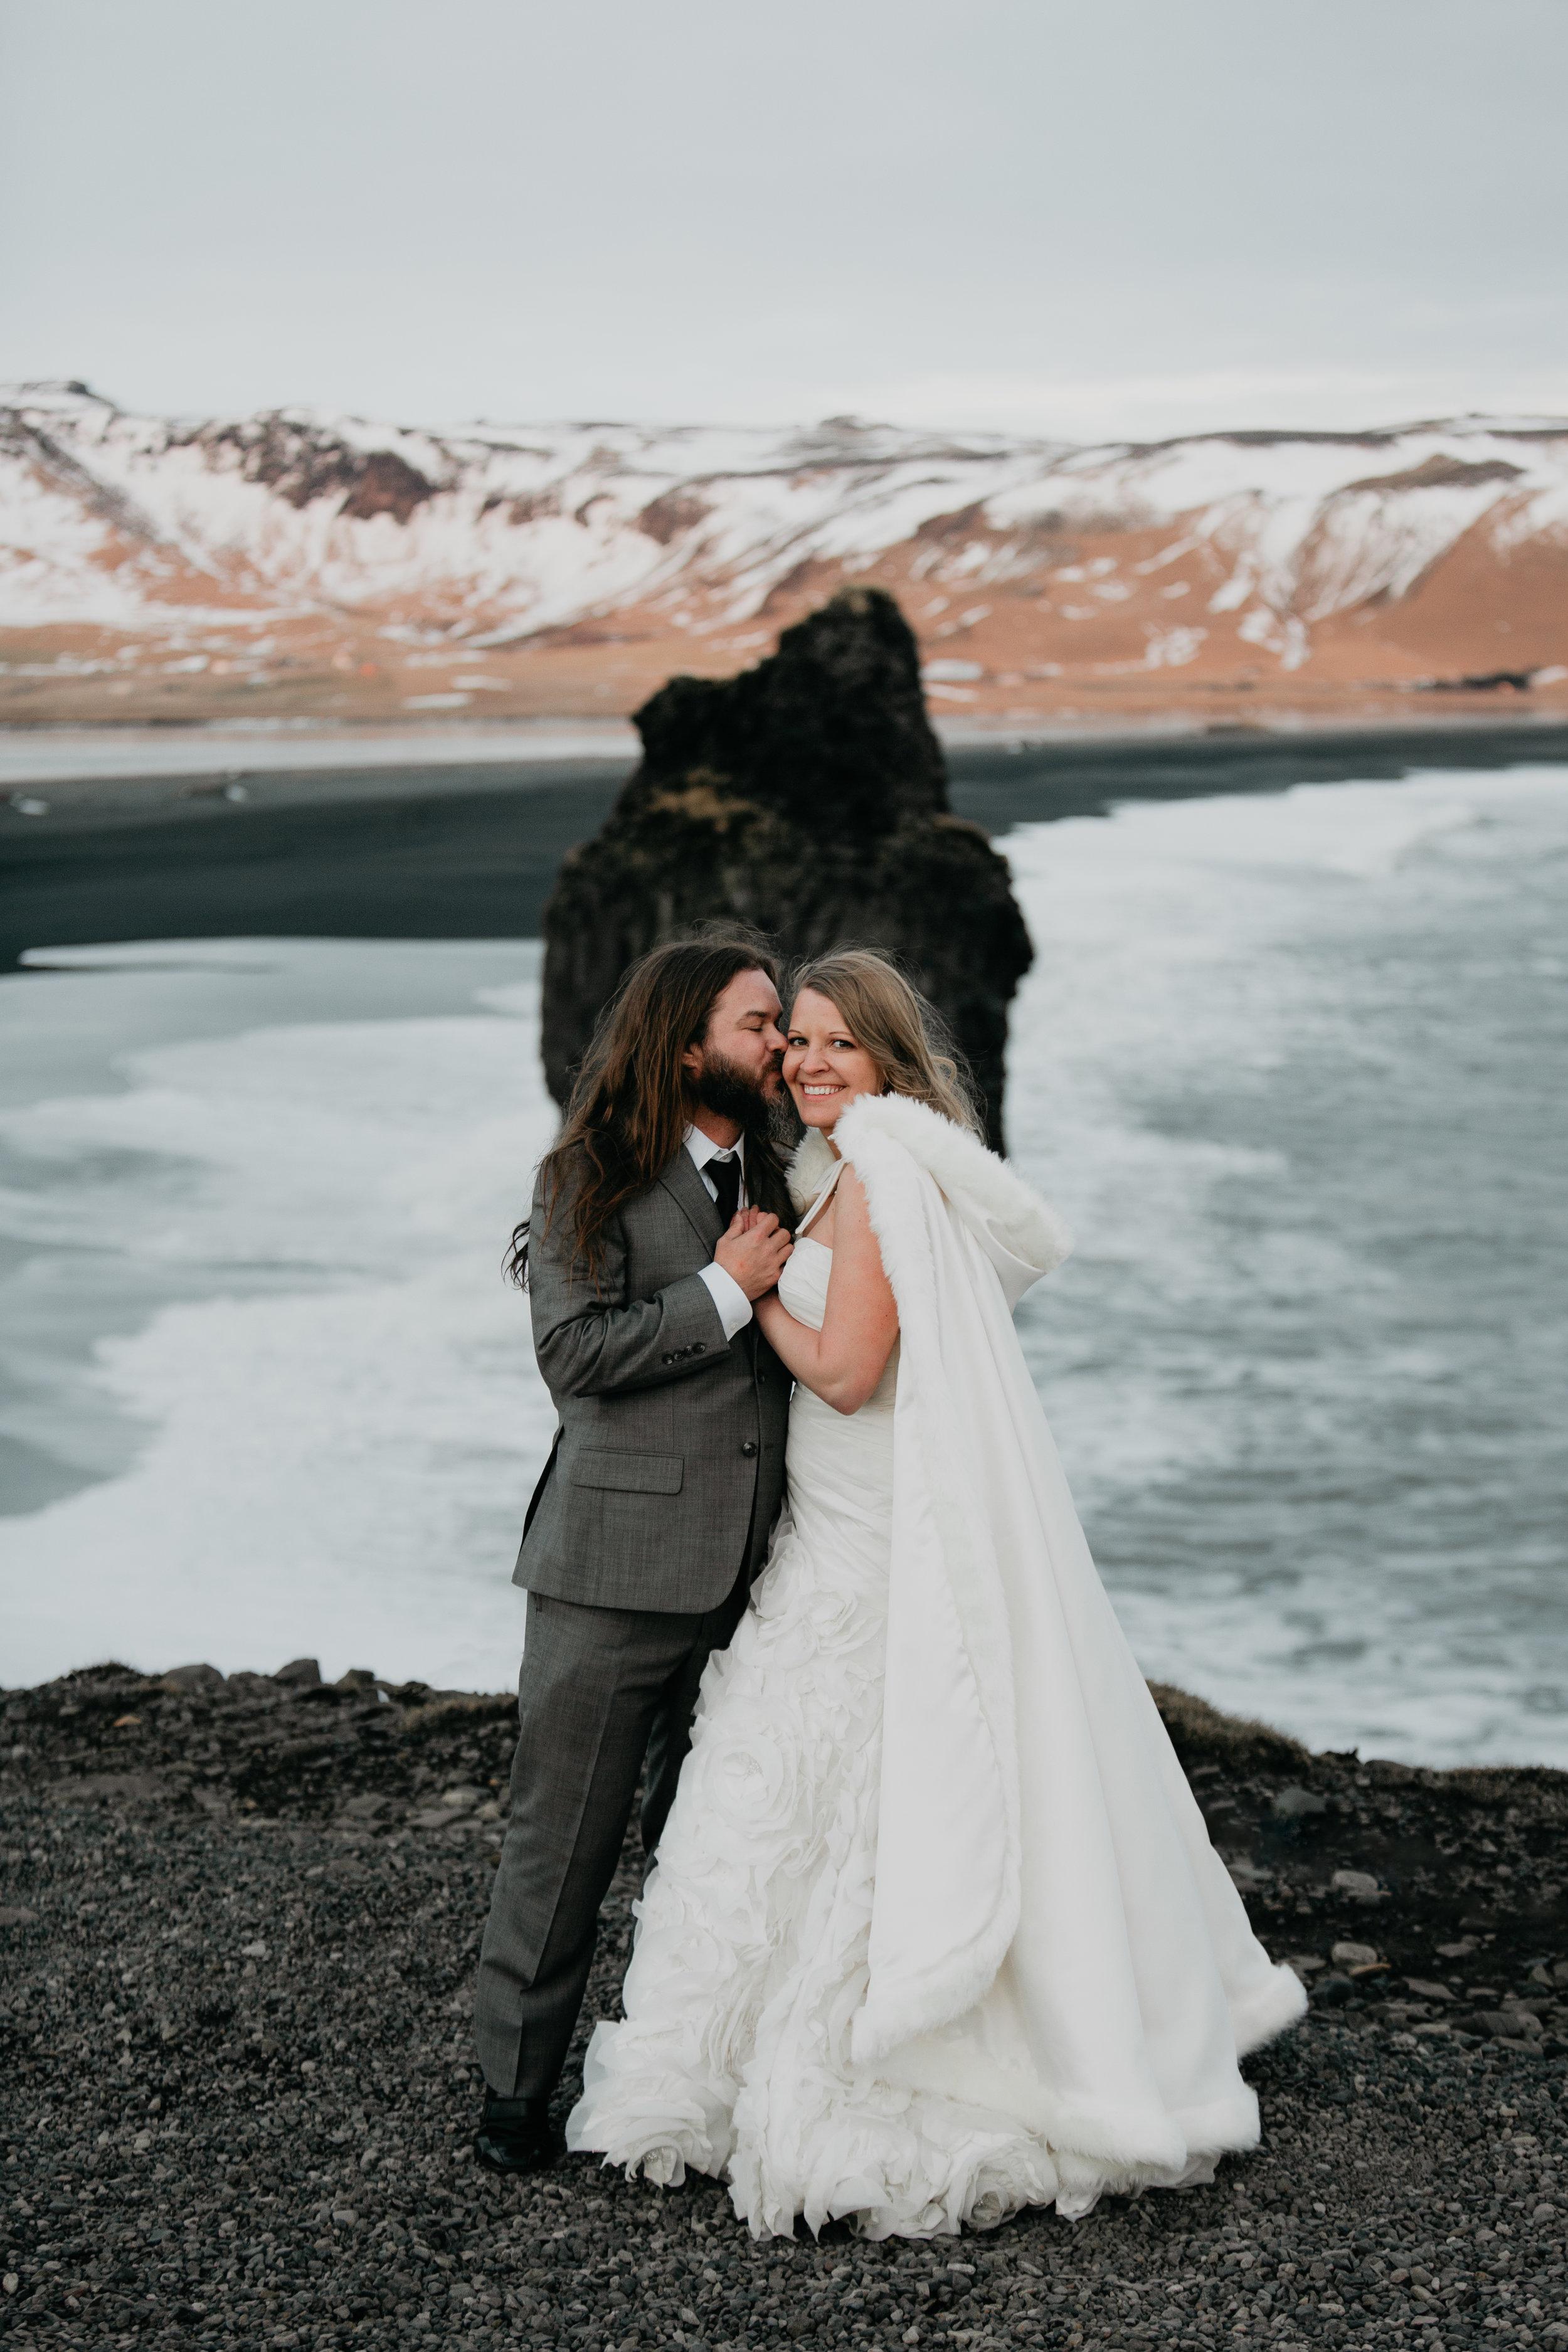 nicole-daacke-photography-iceland-winter-sunset-adventure-elopement-skogafoss-waterfall-black-sand-beach-dyrholaey-vik-iceland-intimate-wedding-black-church-elopement-photographer-48.jpg